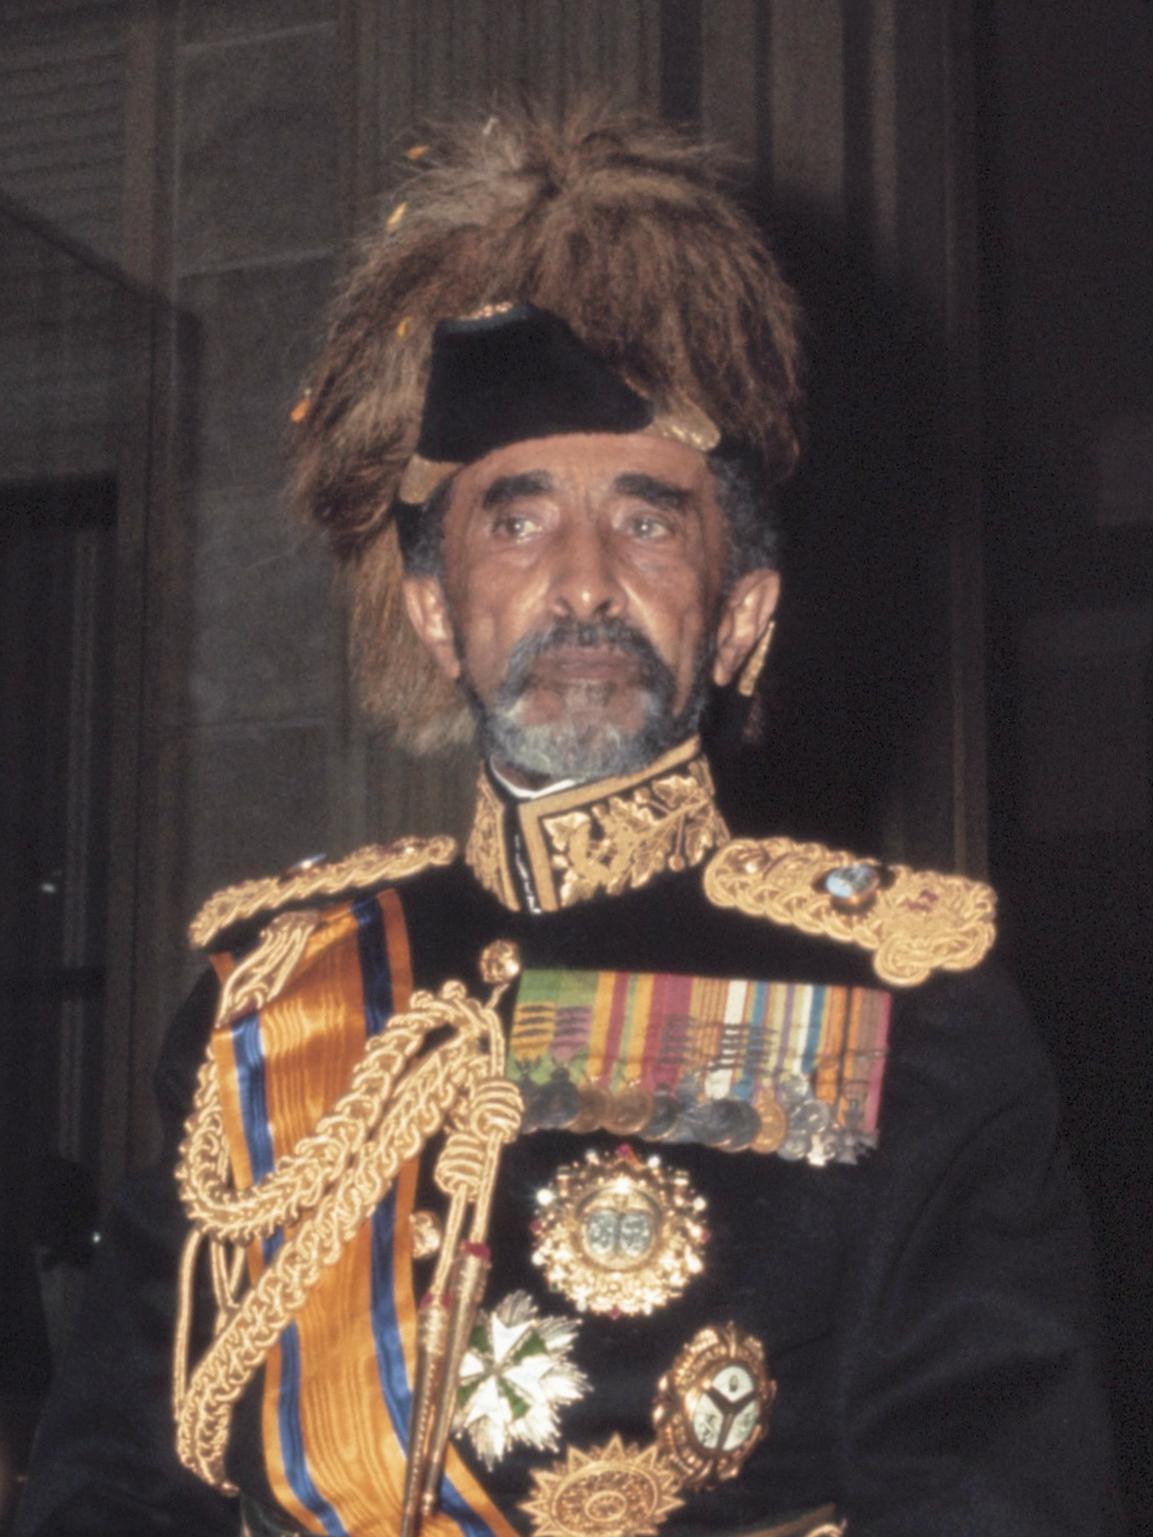 Portrait of Haile Selassie